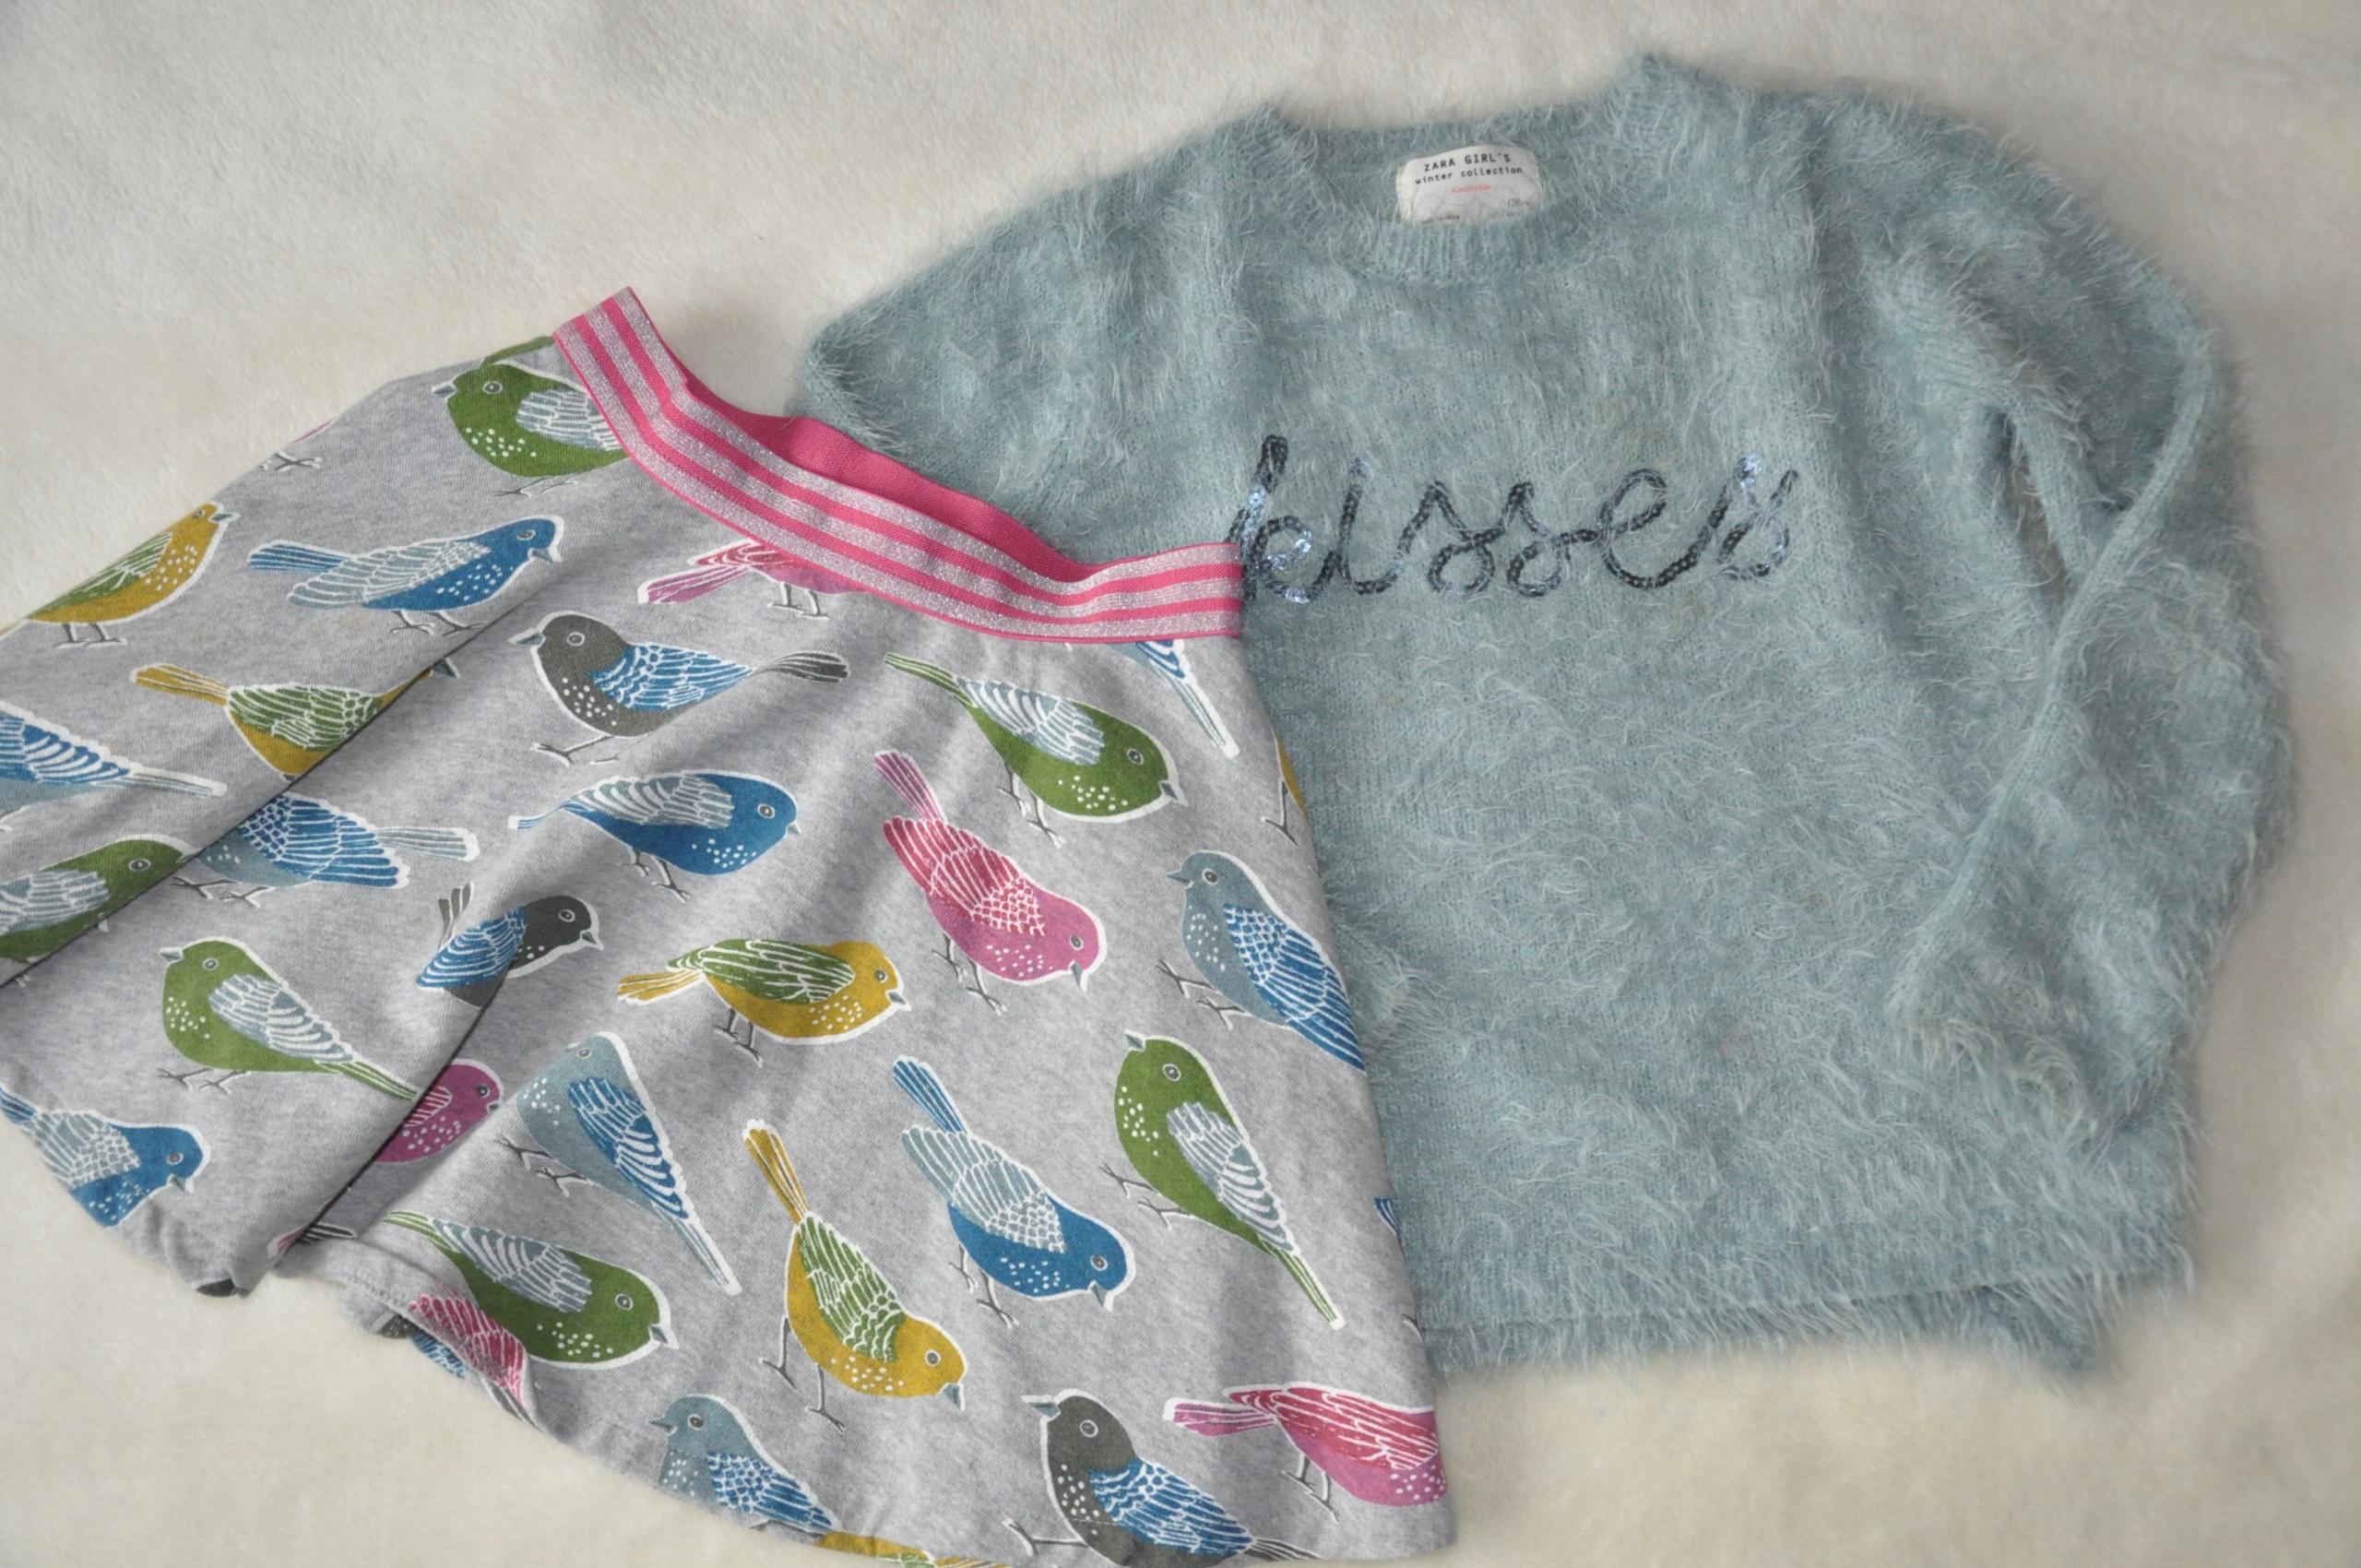 Mini Boden spódnica i Zara sweter rozm. 128